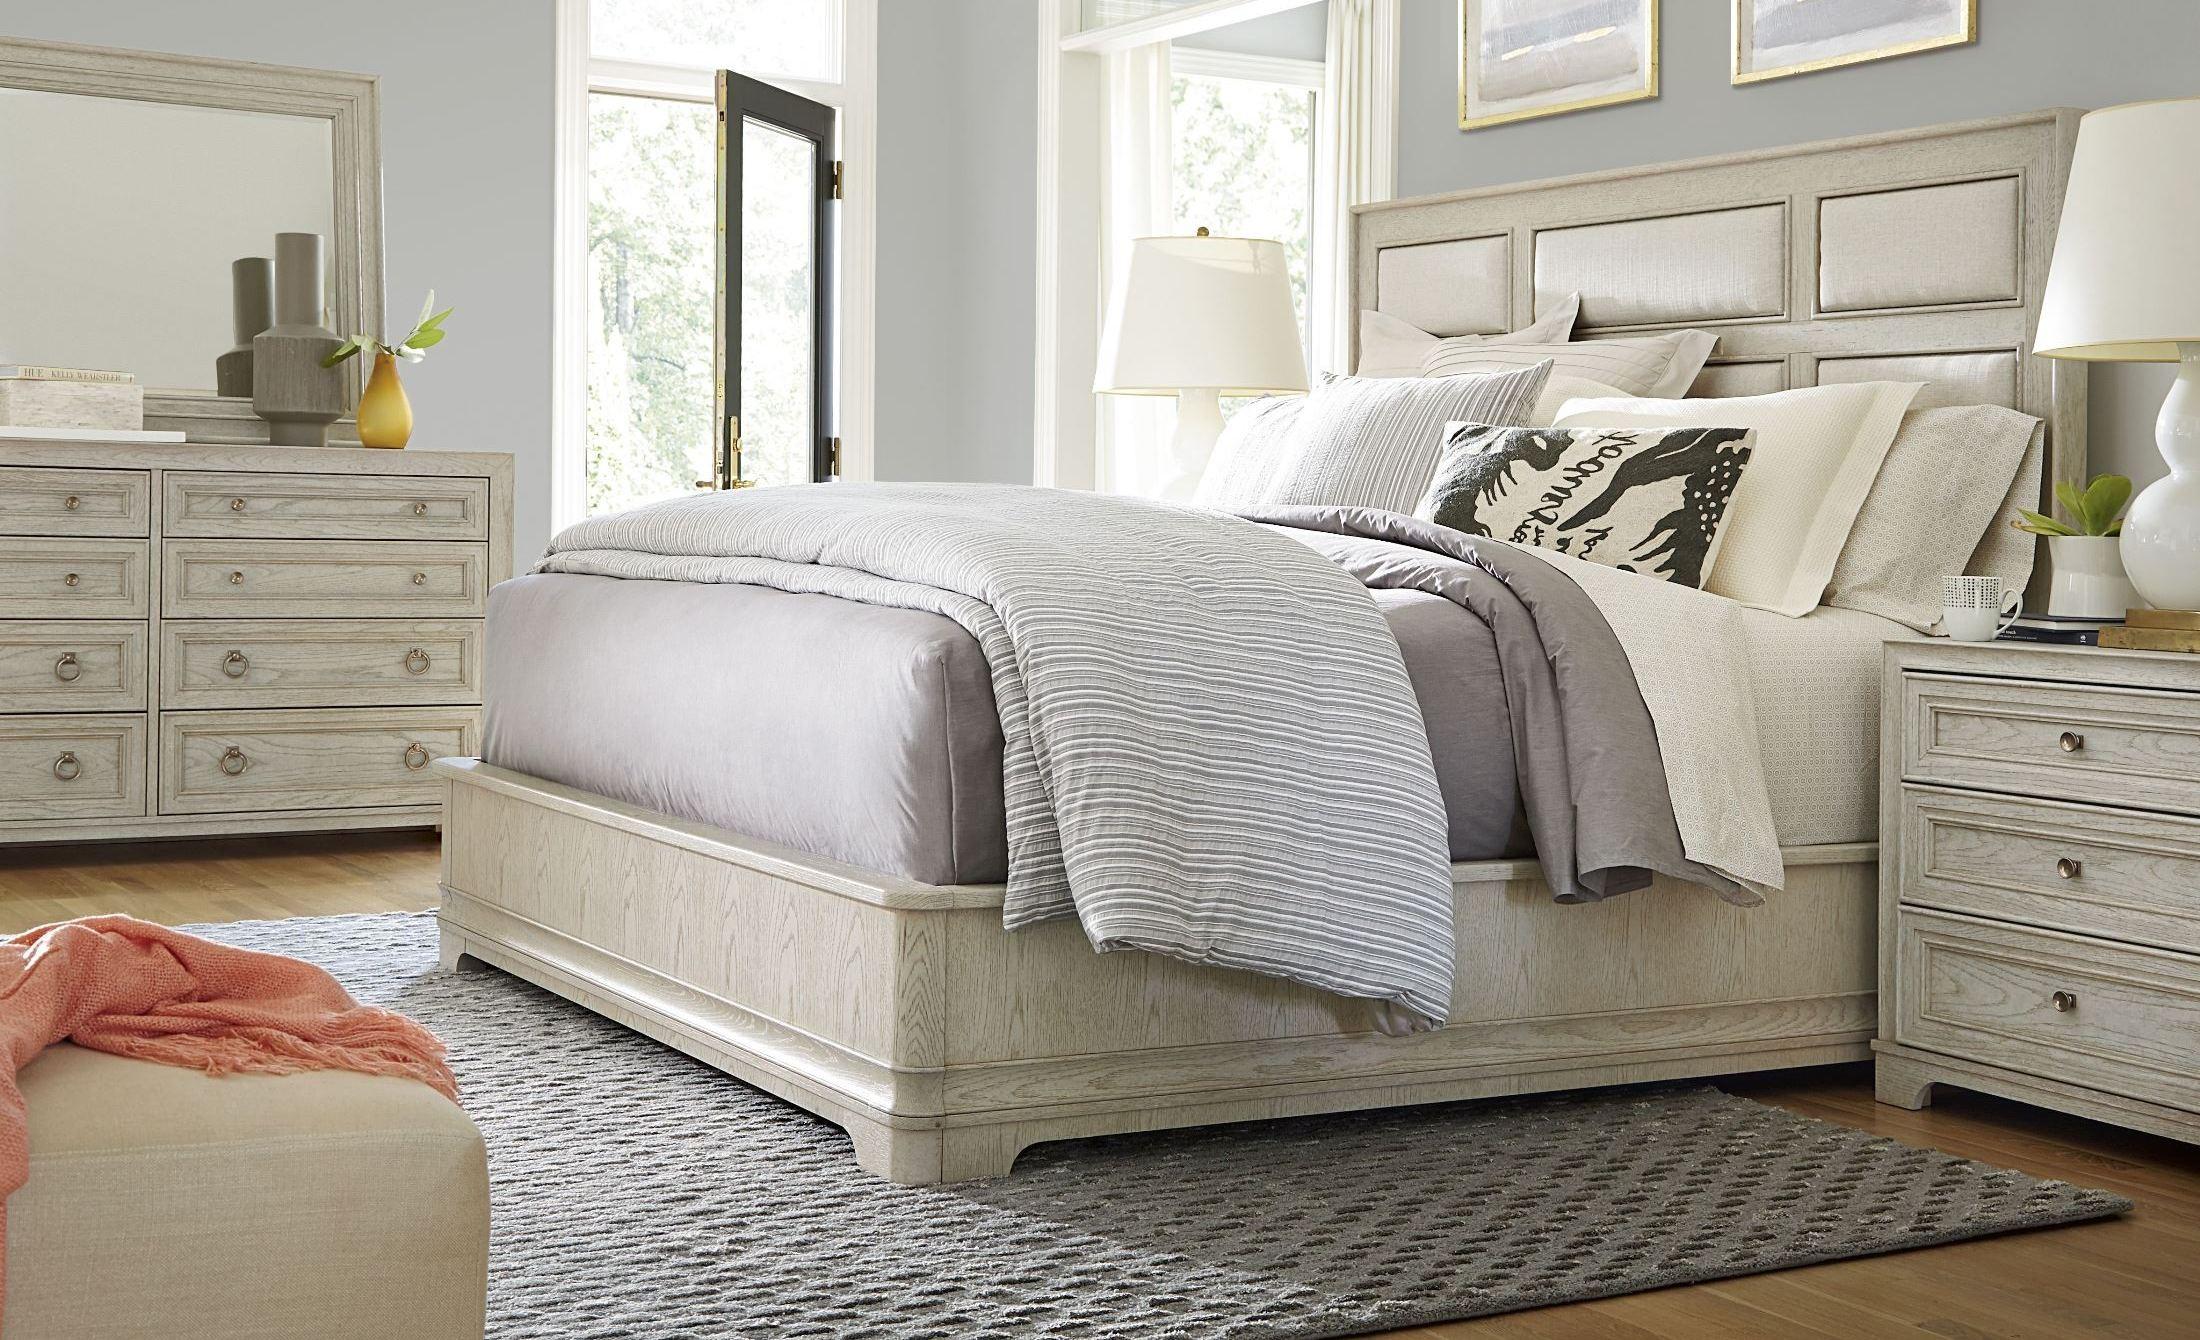 california malibu platform bedroom set from universal 476210b coleman furniture. Black Bedroom Furniture Sets. Home Design Ideas